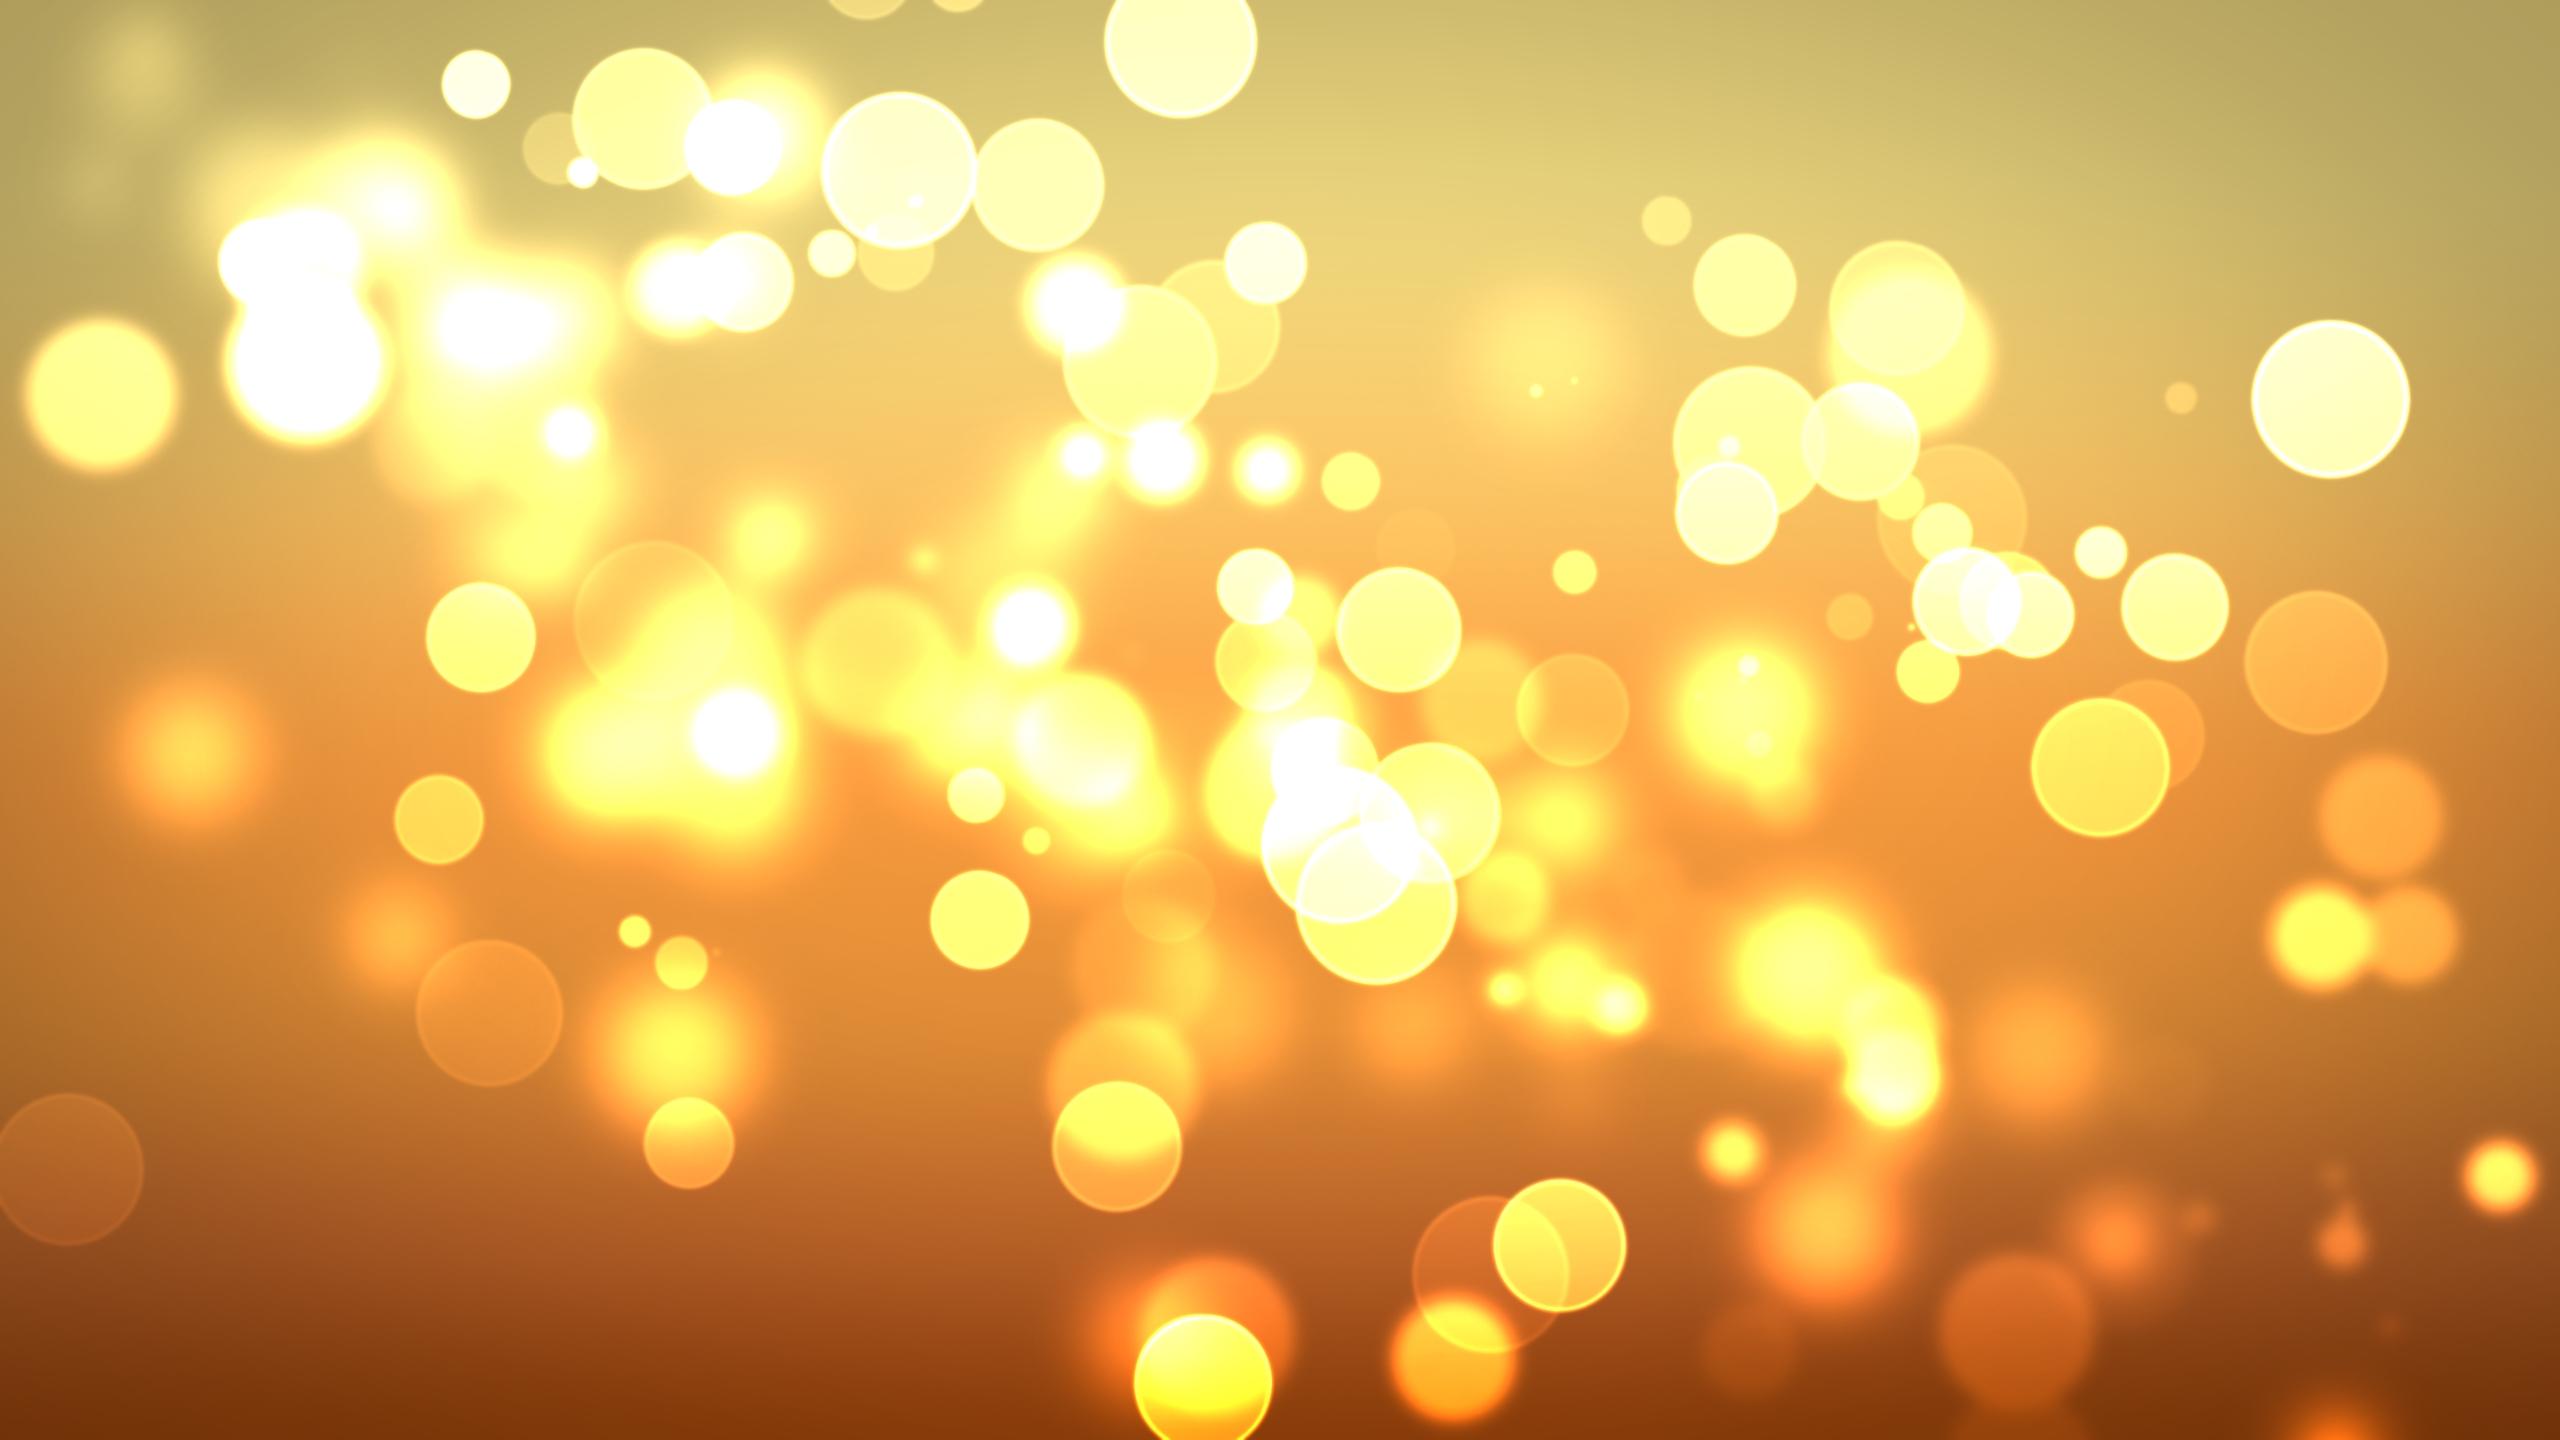 Glare Light HD Desktop Wallpaper 18151 - Baltana